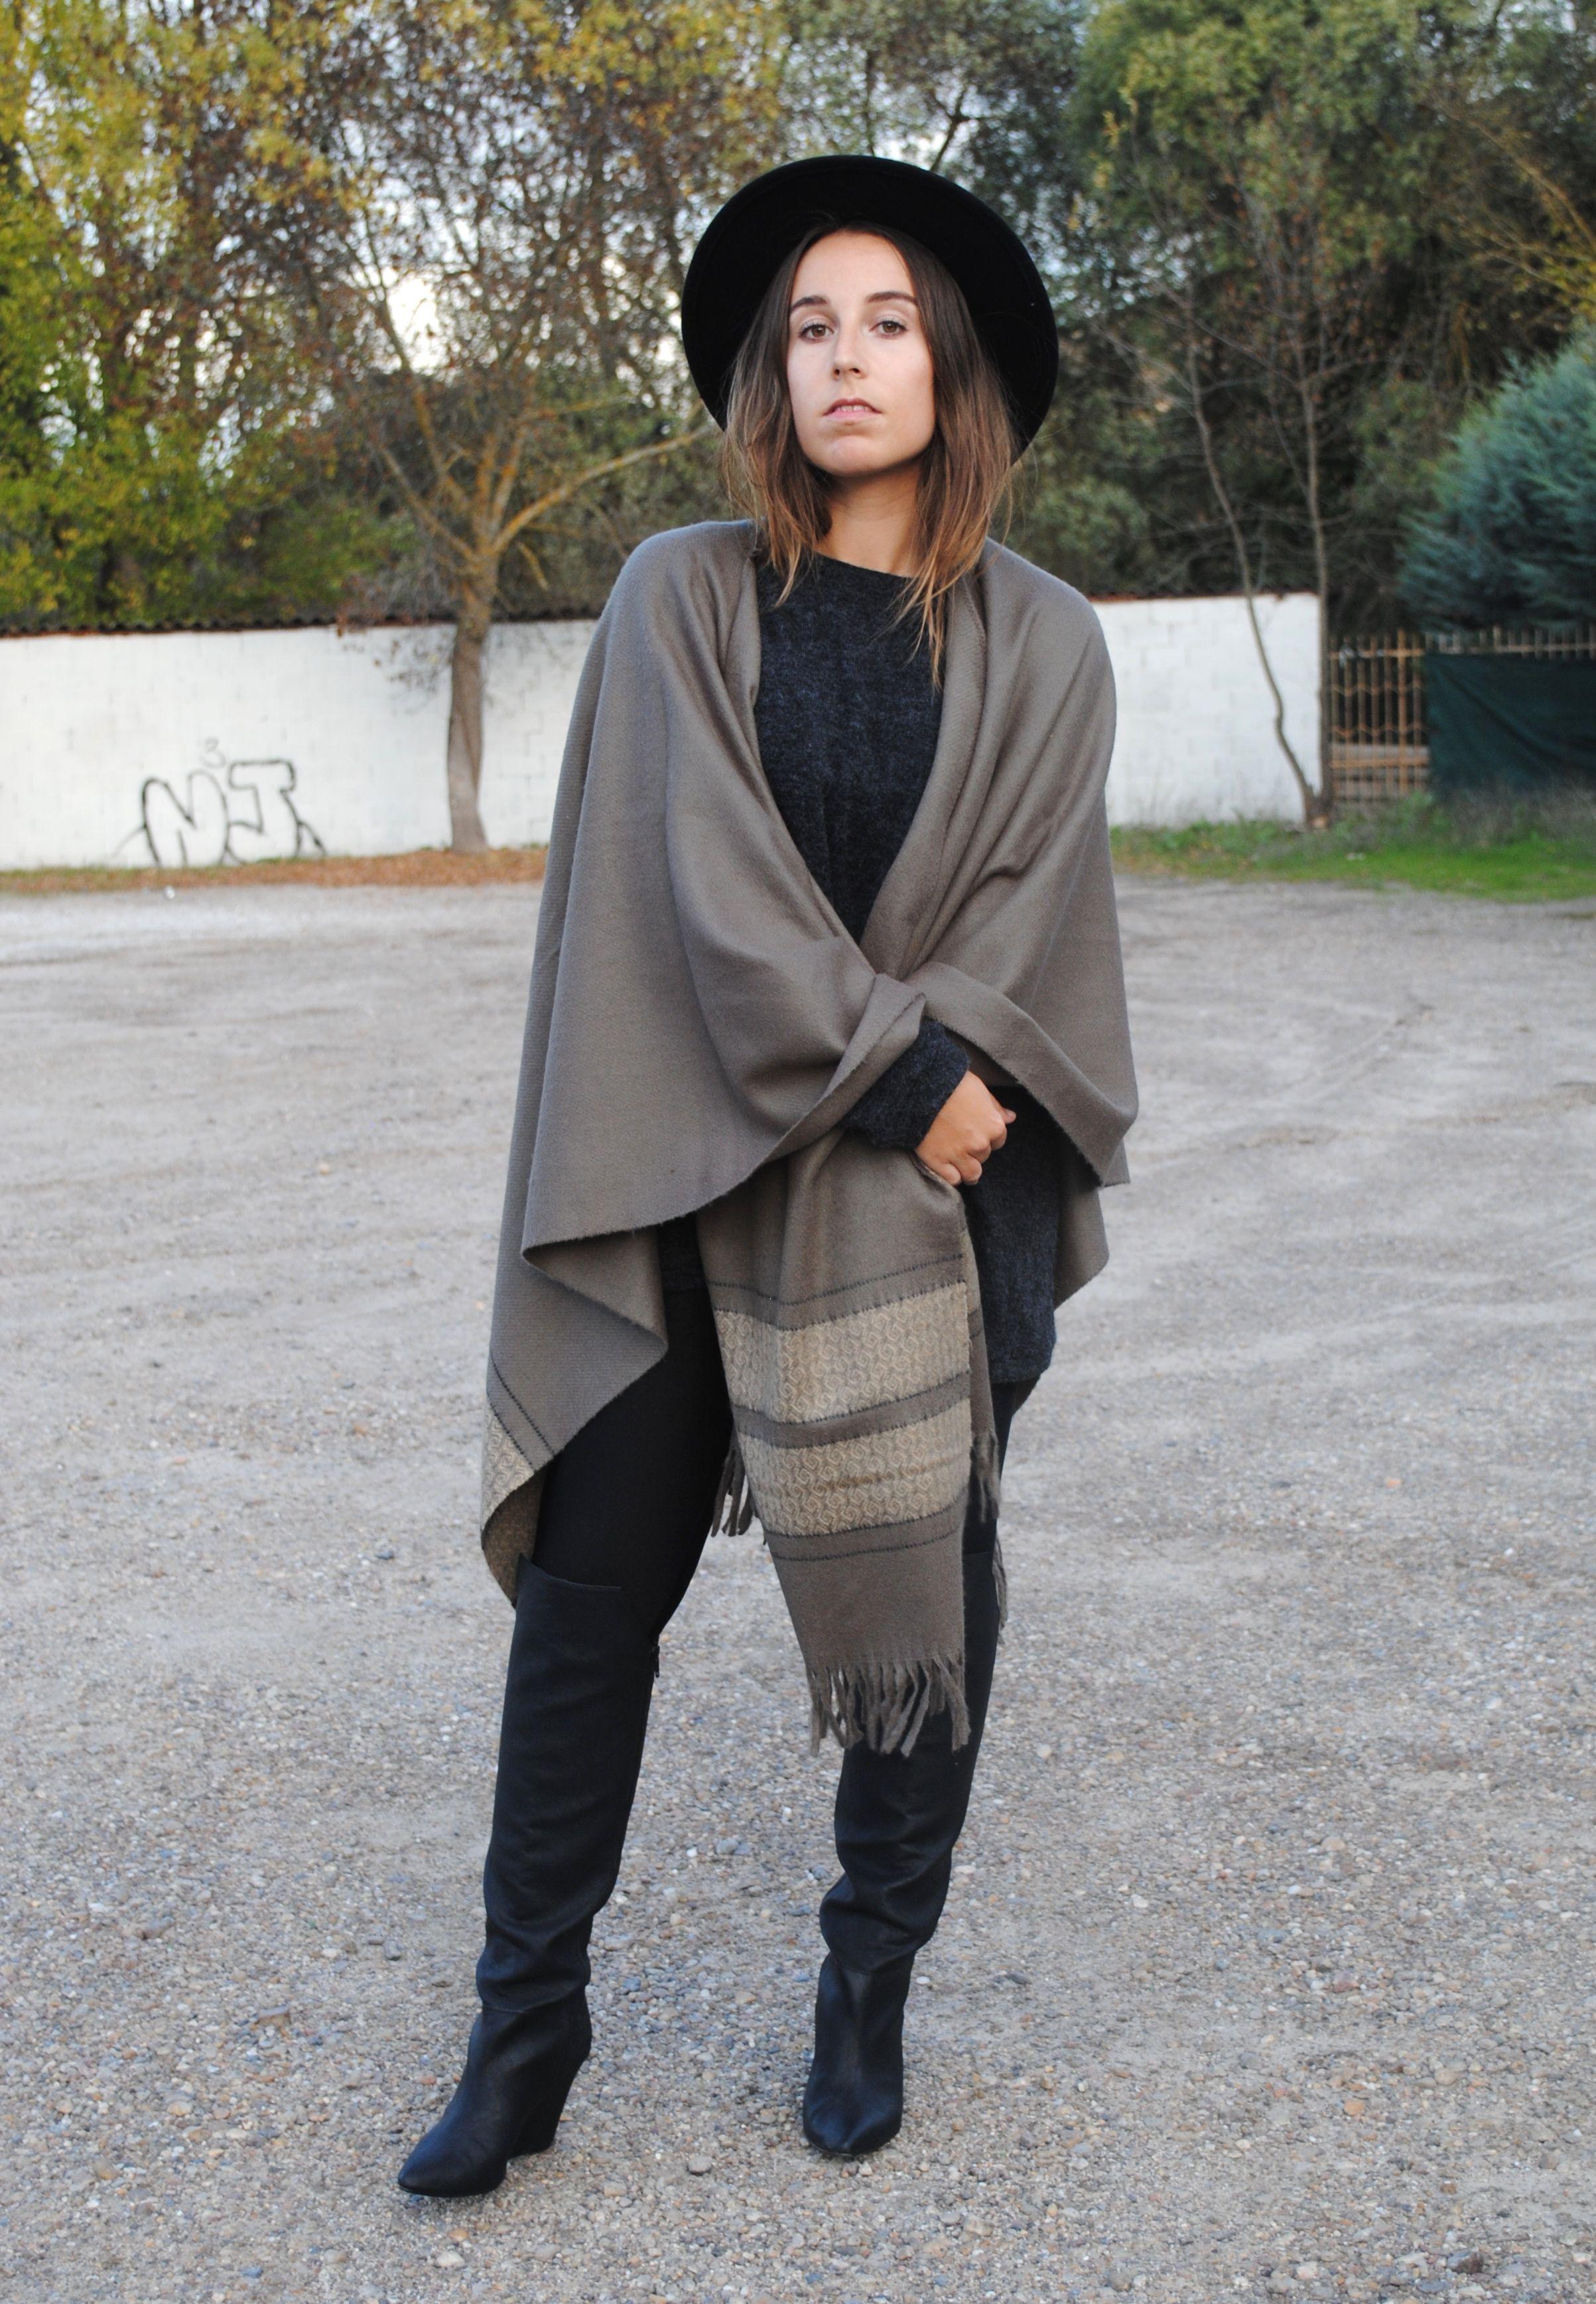 Women's Grey Shawl, Charcoal Knit Oversized Sweater, Black ...